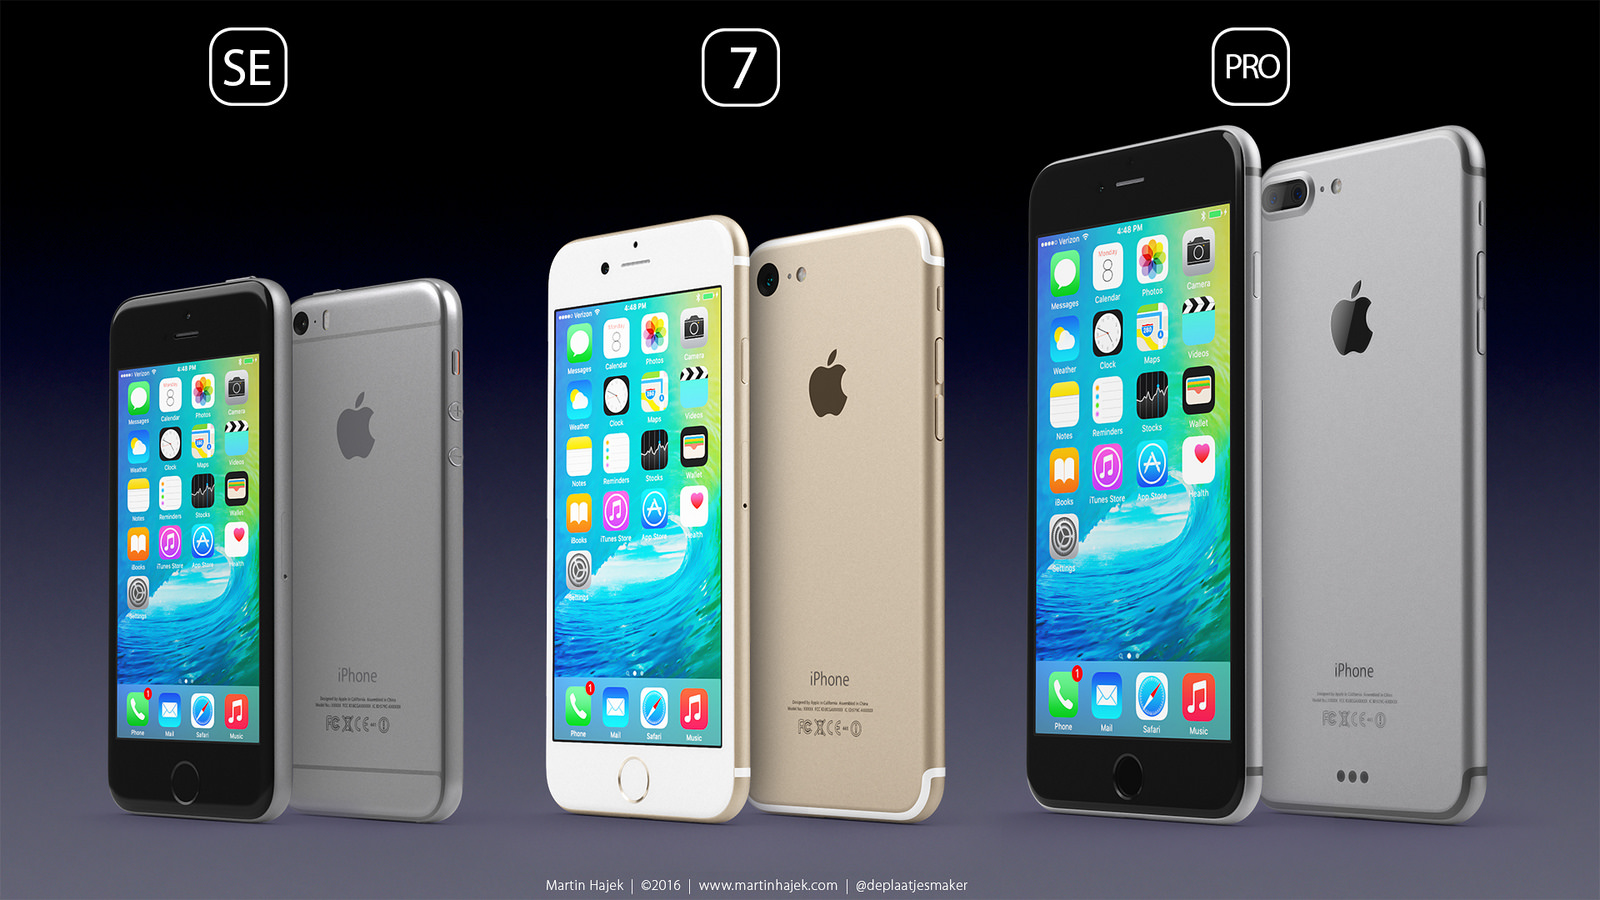 iPhone-7-Pro-SE-Martin-Hajek